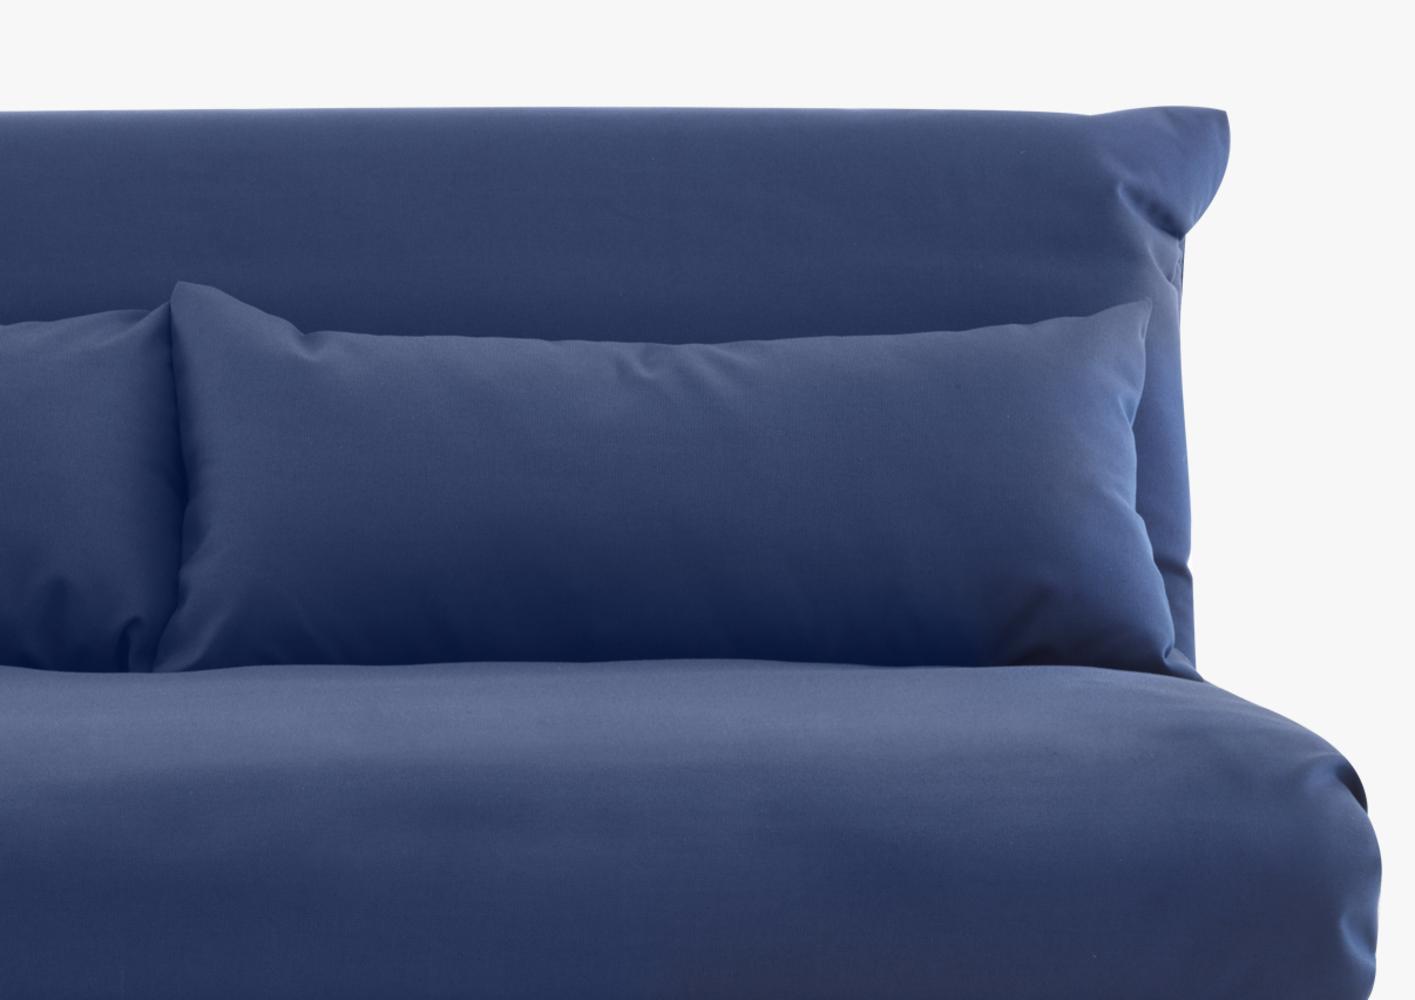 B Linea Slaapbank.Multy Sofa Beds From Designer Claude Brisson Ligne Roset